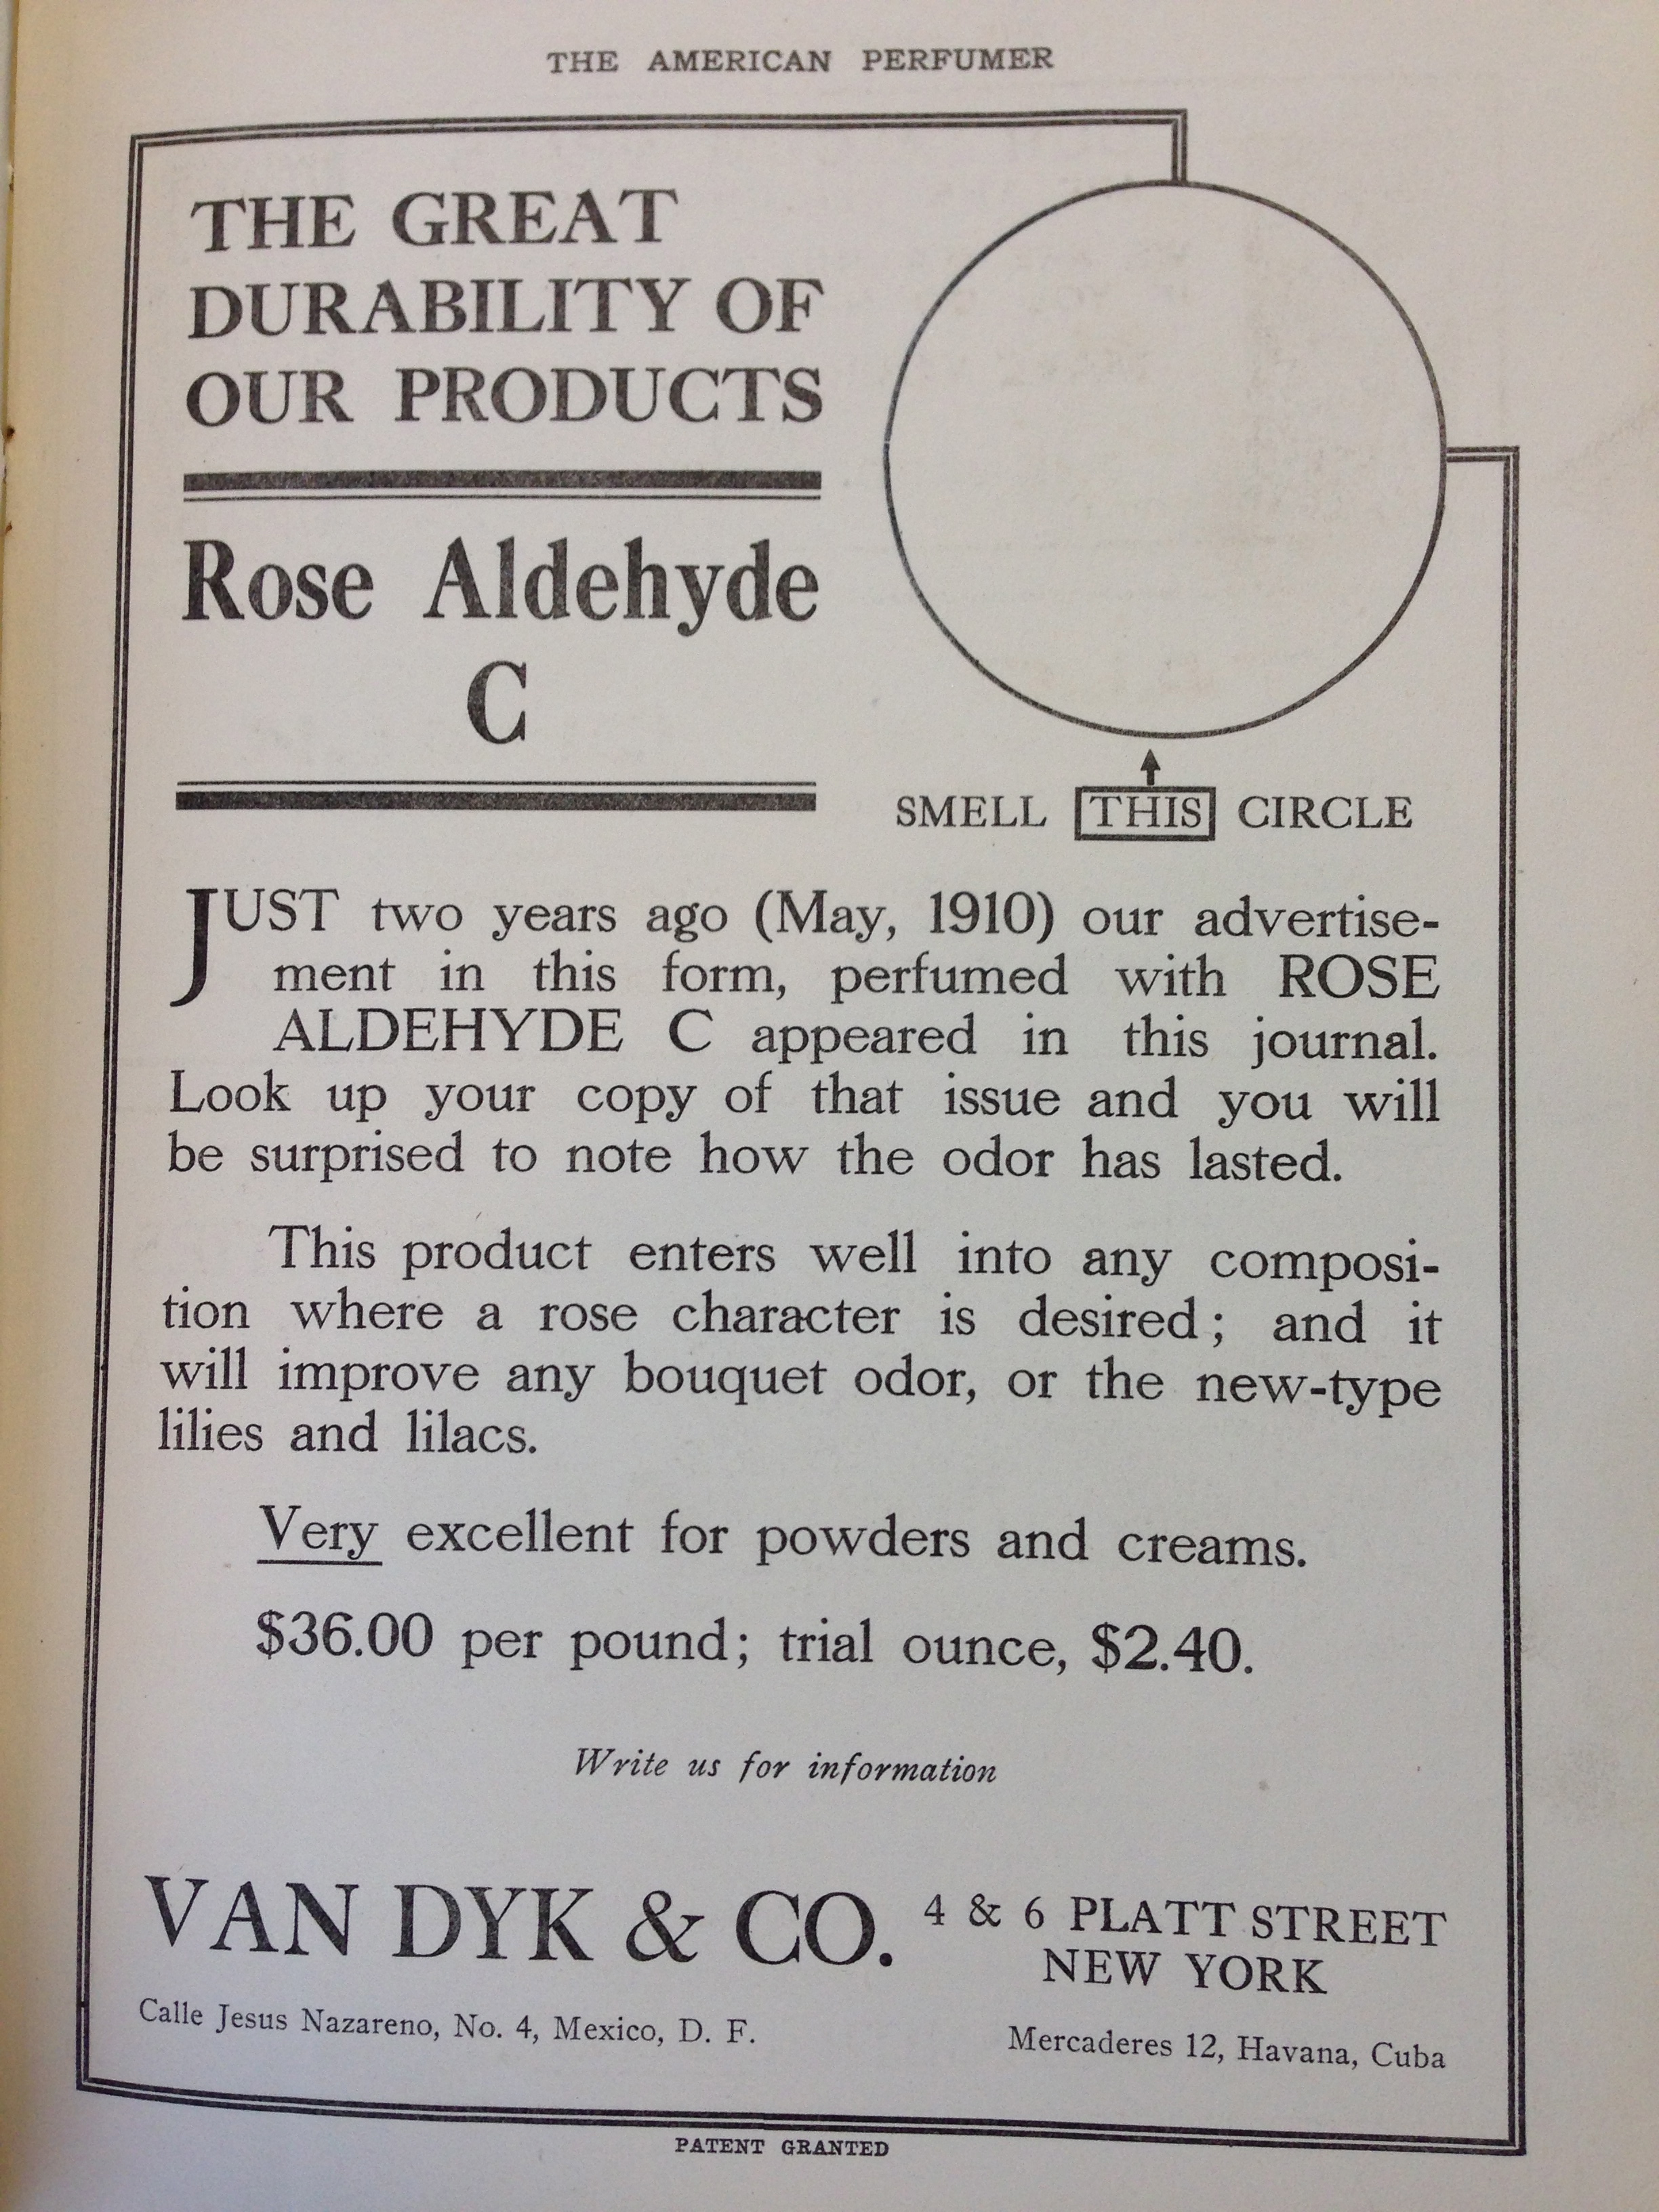 Rose Aldehyde C Fragance Insert.jpg